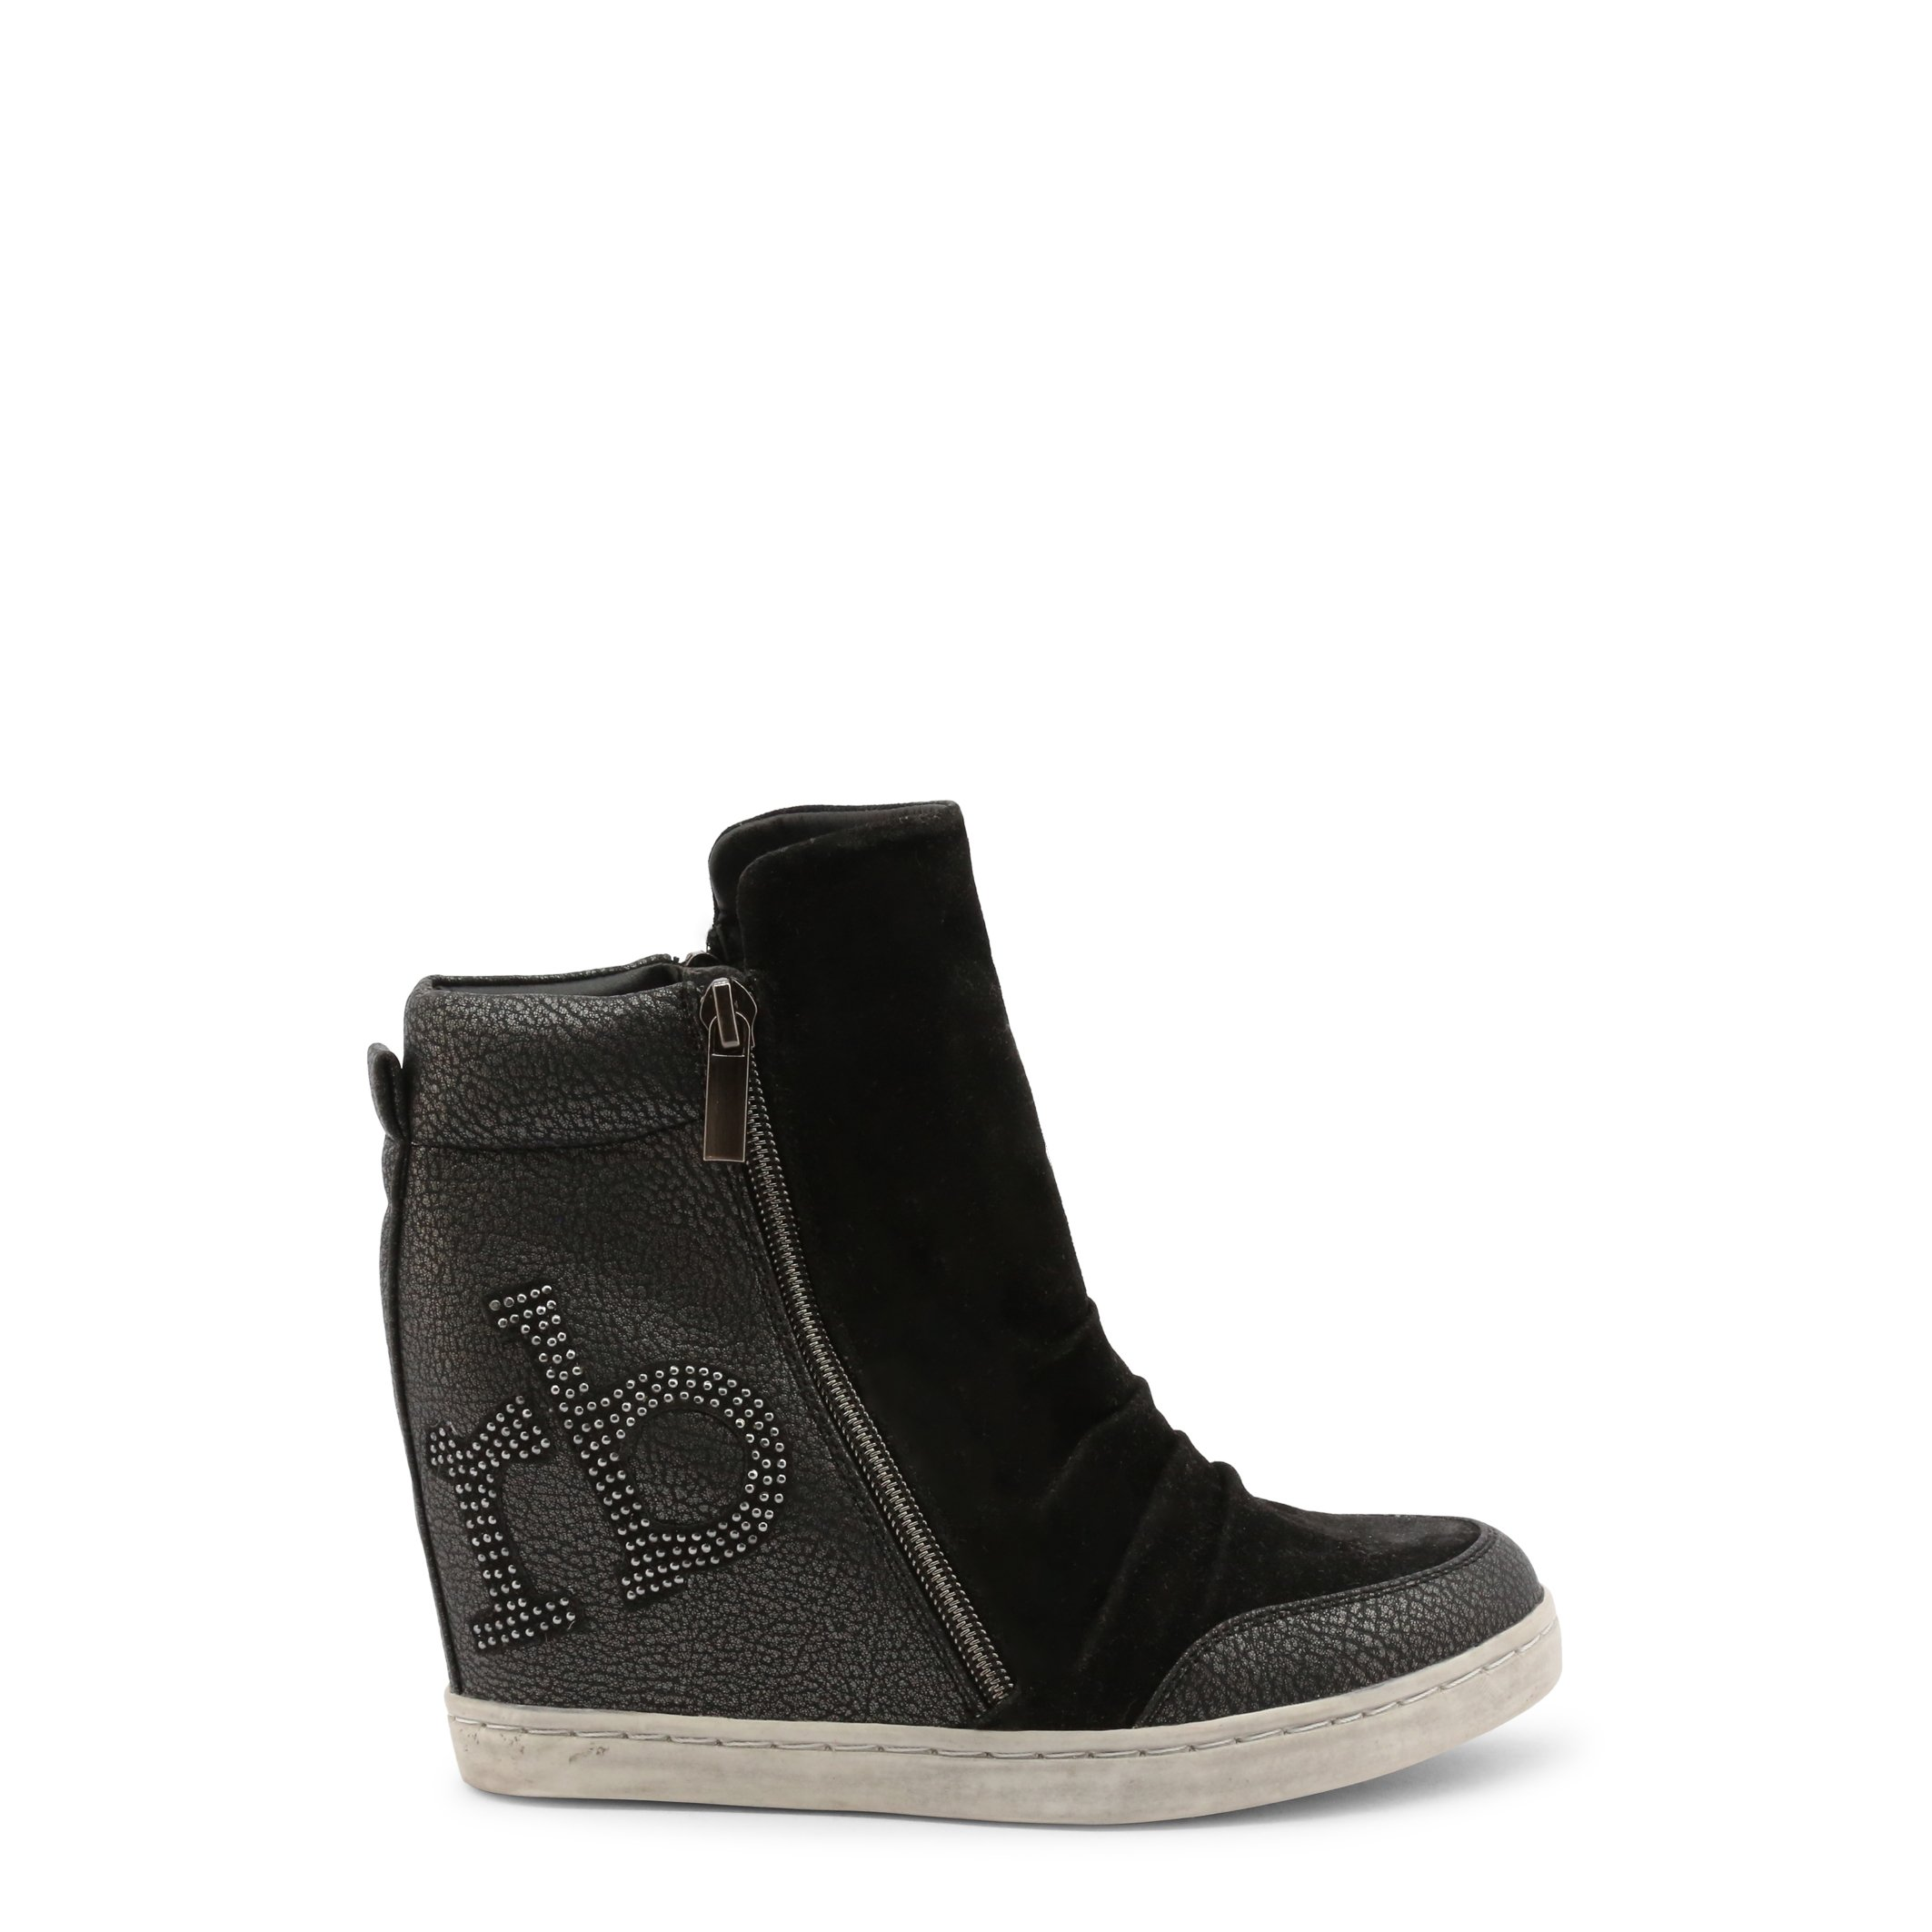 Roccobarocco Women's Ankle Boots Grey 342832 - black EU 37